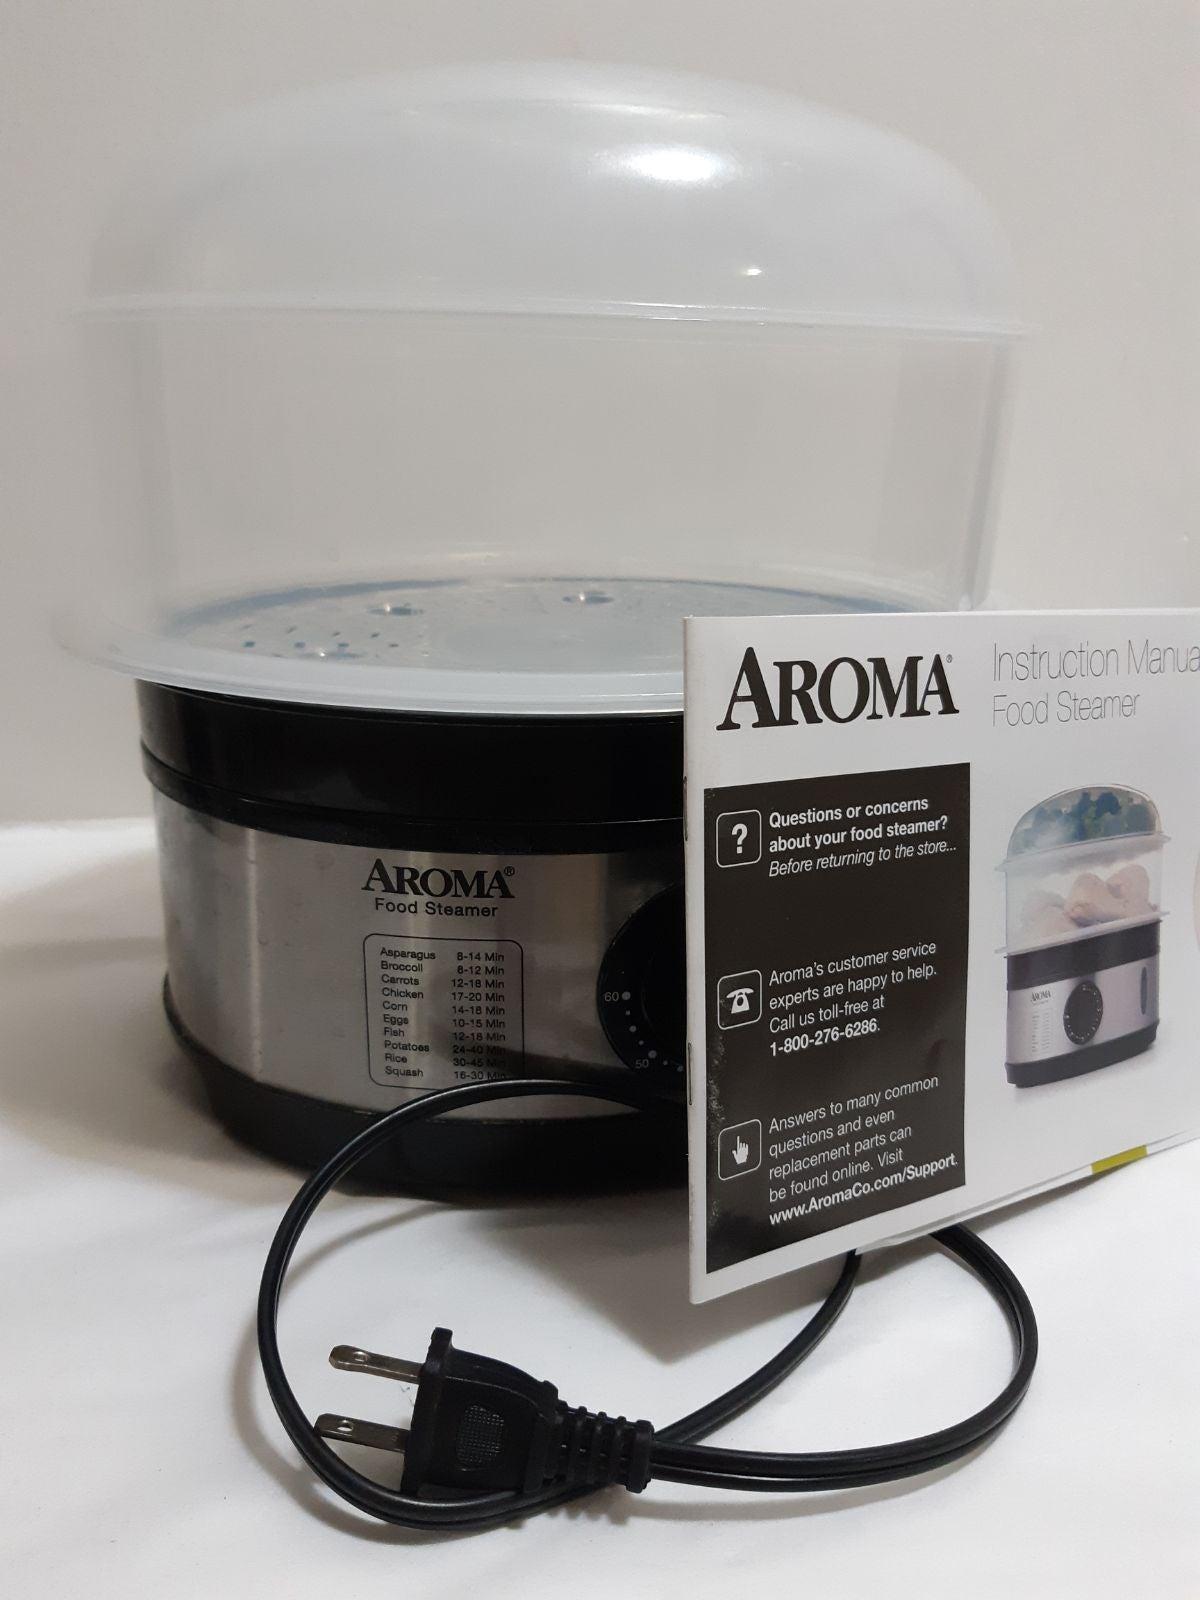 Aroma Housewares 5-Quart Food Steamer, S